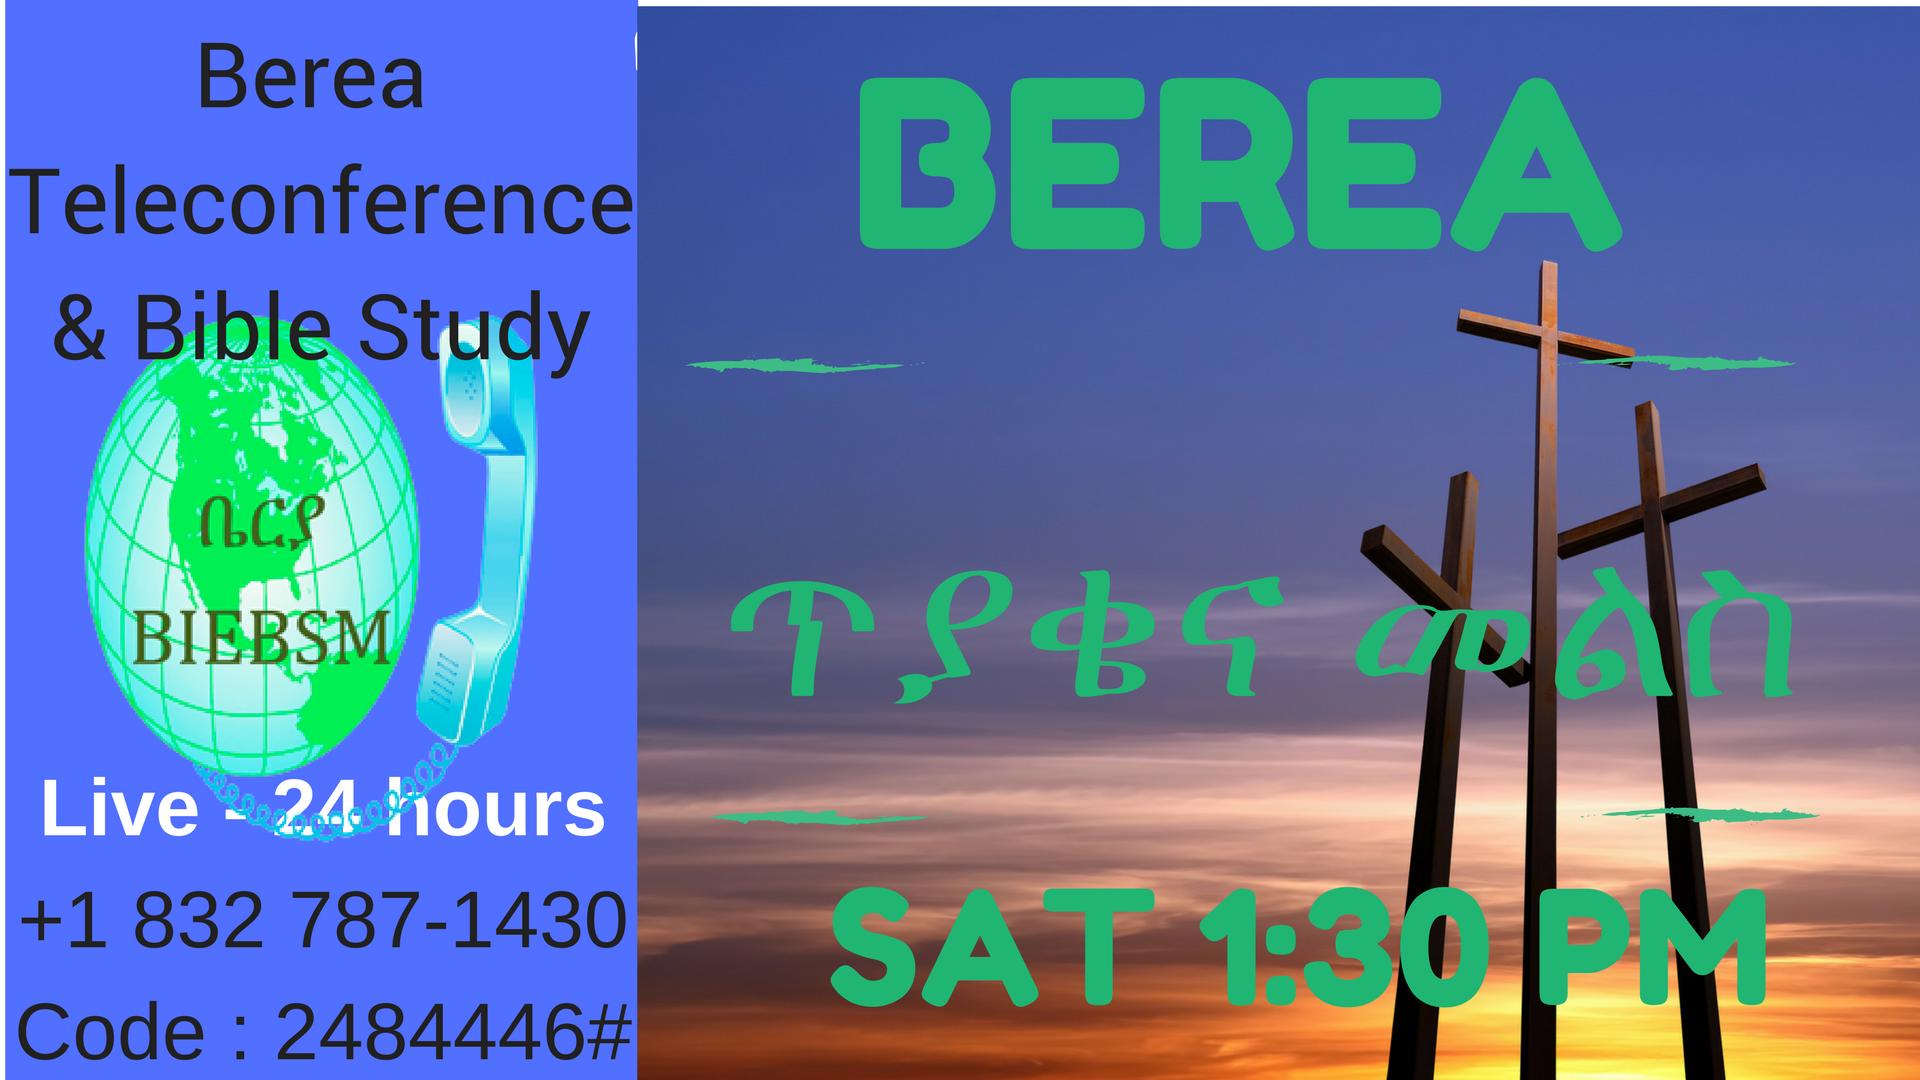 Berea Bible Study - Clear Lake Bible Church